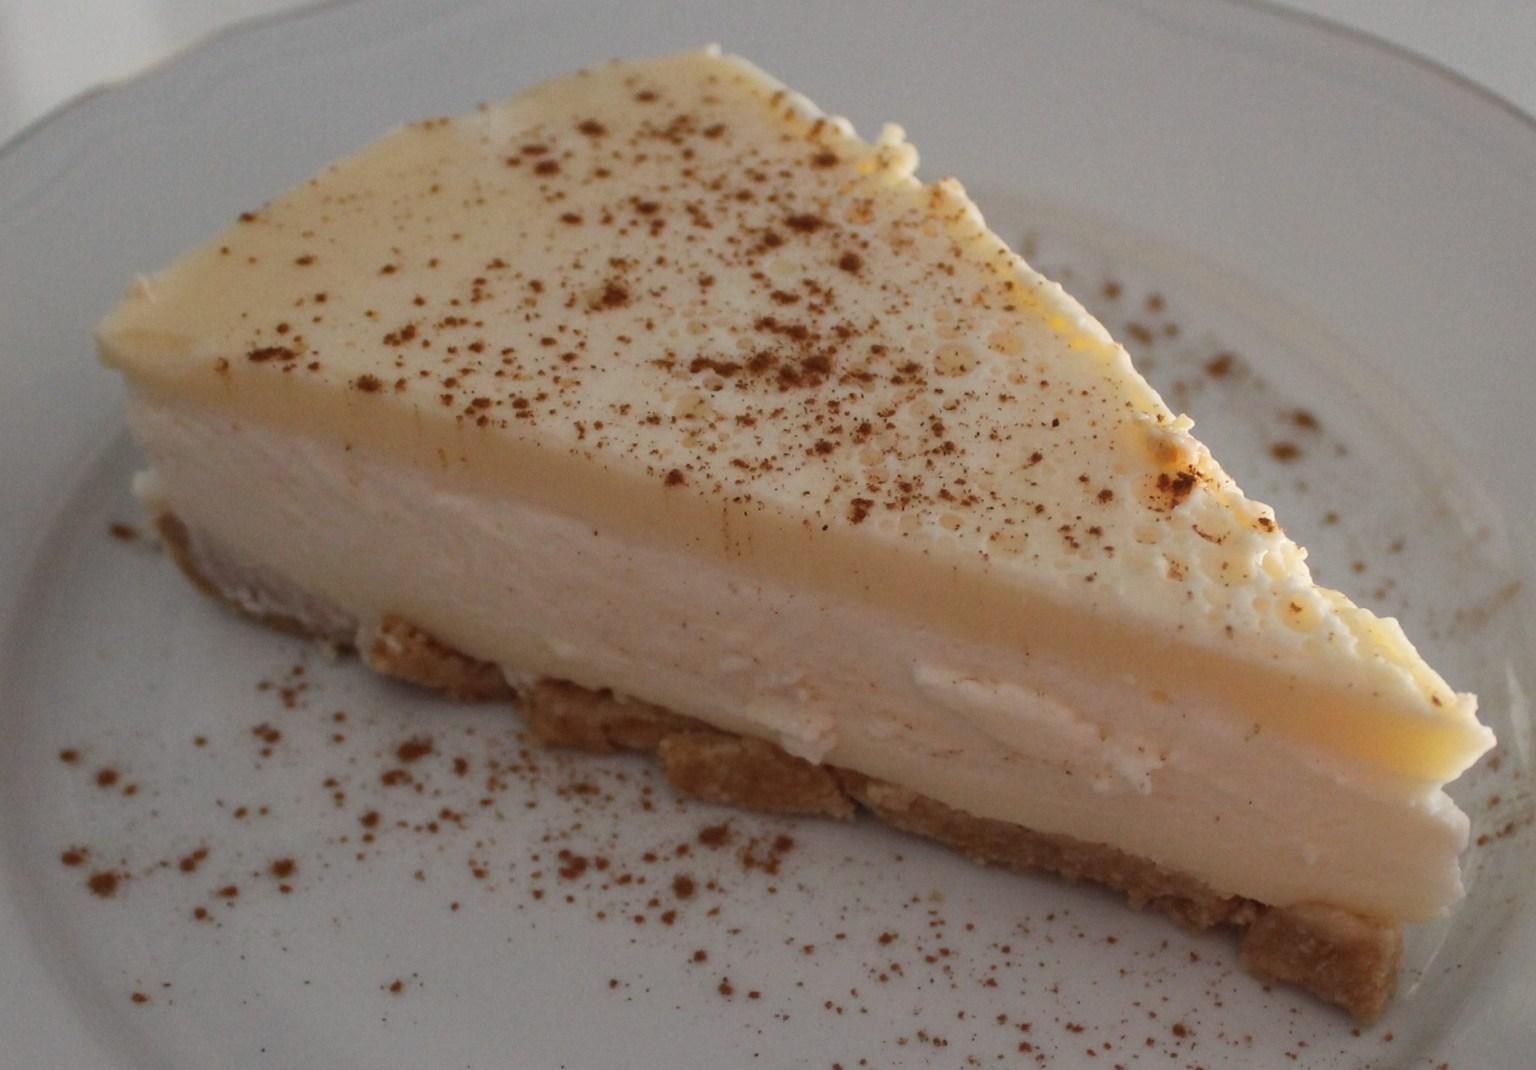 http://yoyomismaymiscosas.com/tarta-crema-de-vainilla/